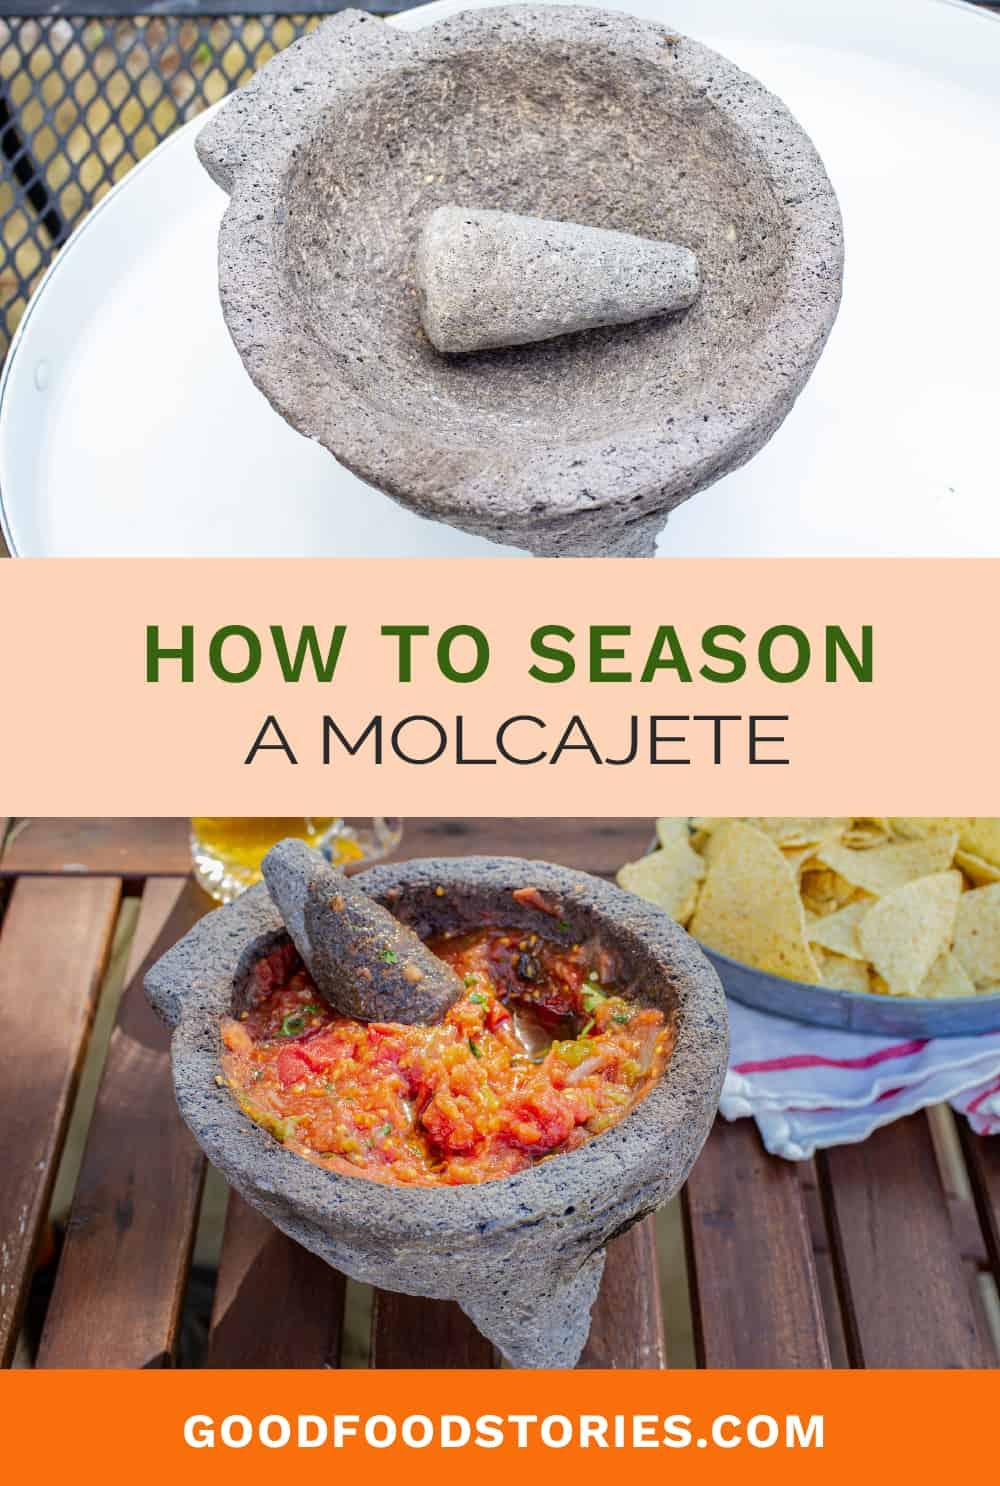 how to season a molcajete